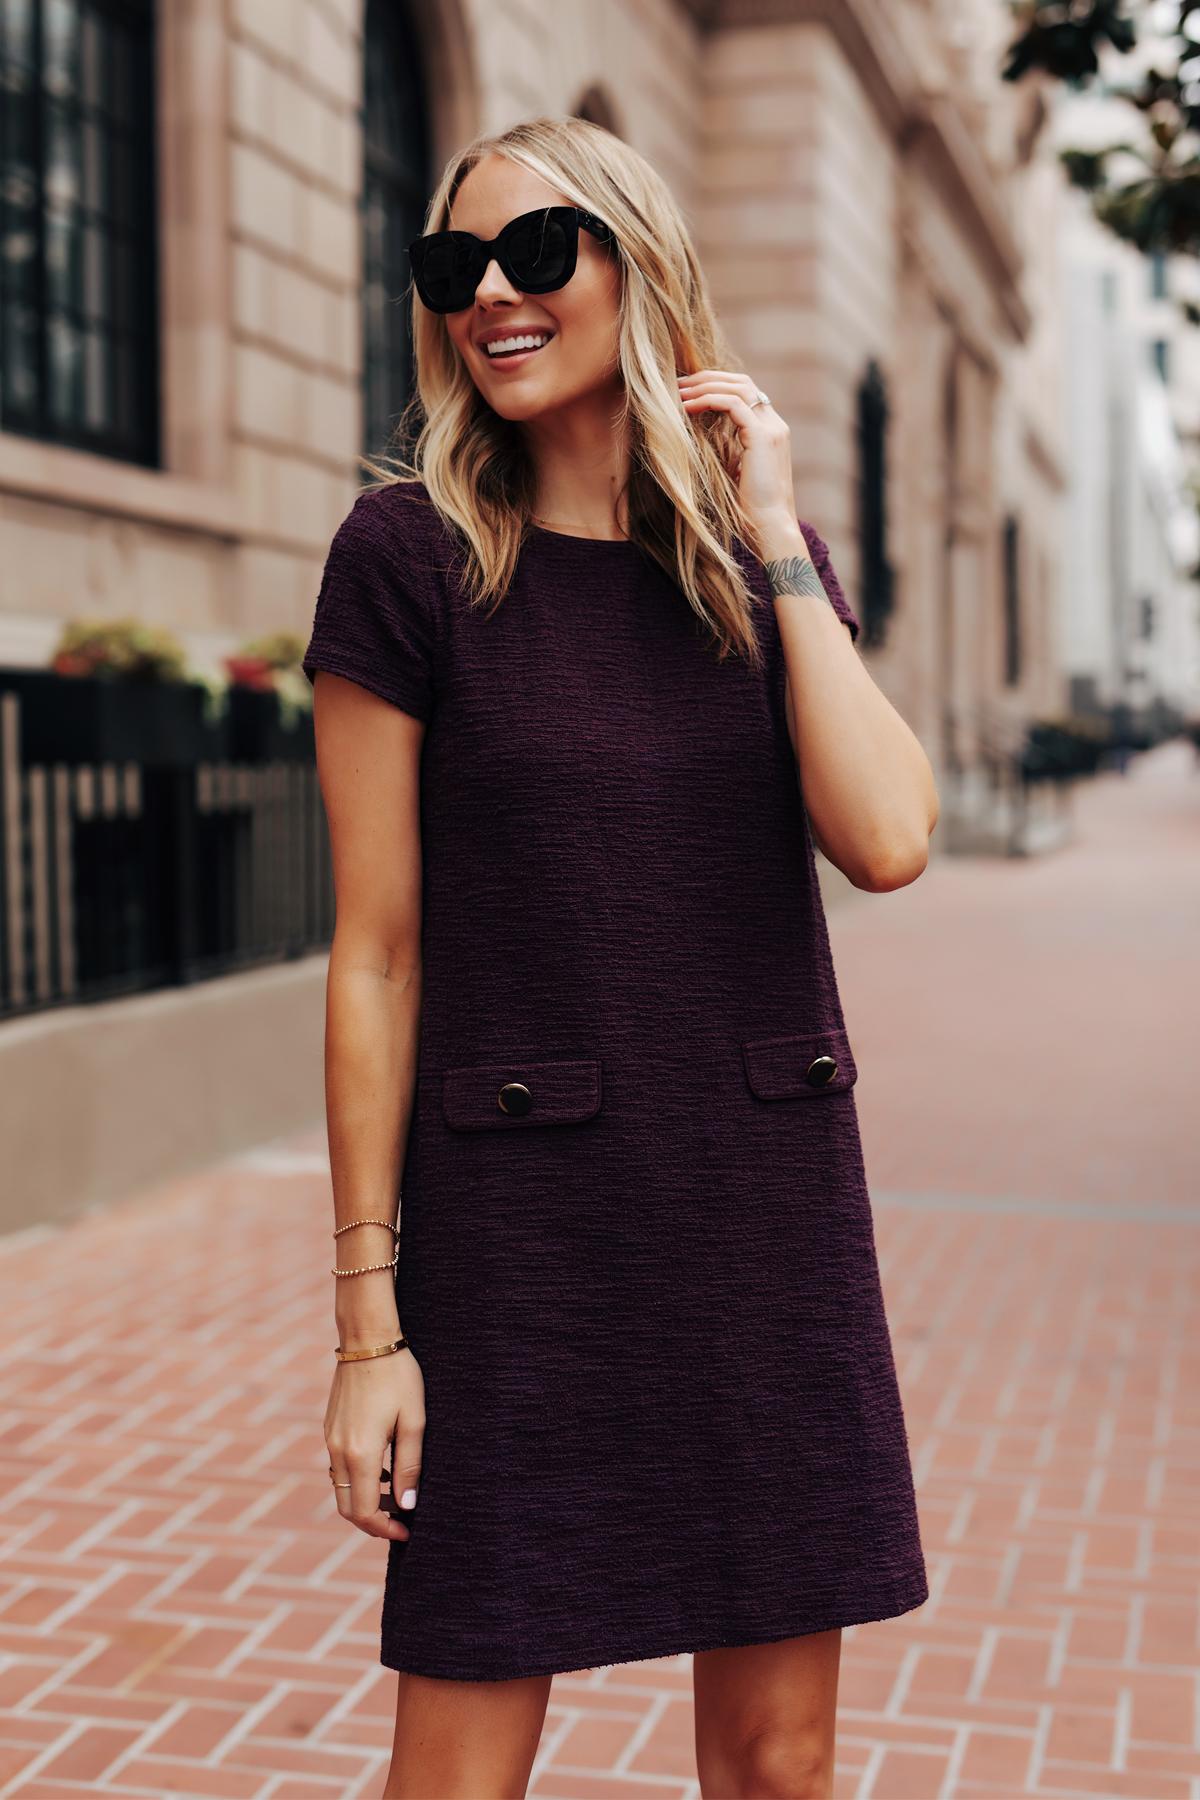 Fashion Jackson Wearing Ann Taylor Purple Tweed Shift Dress Fall Workwear Outfit